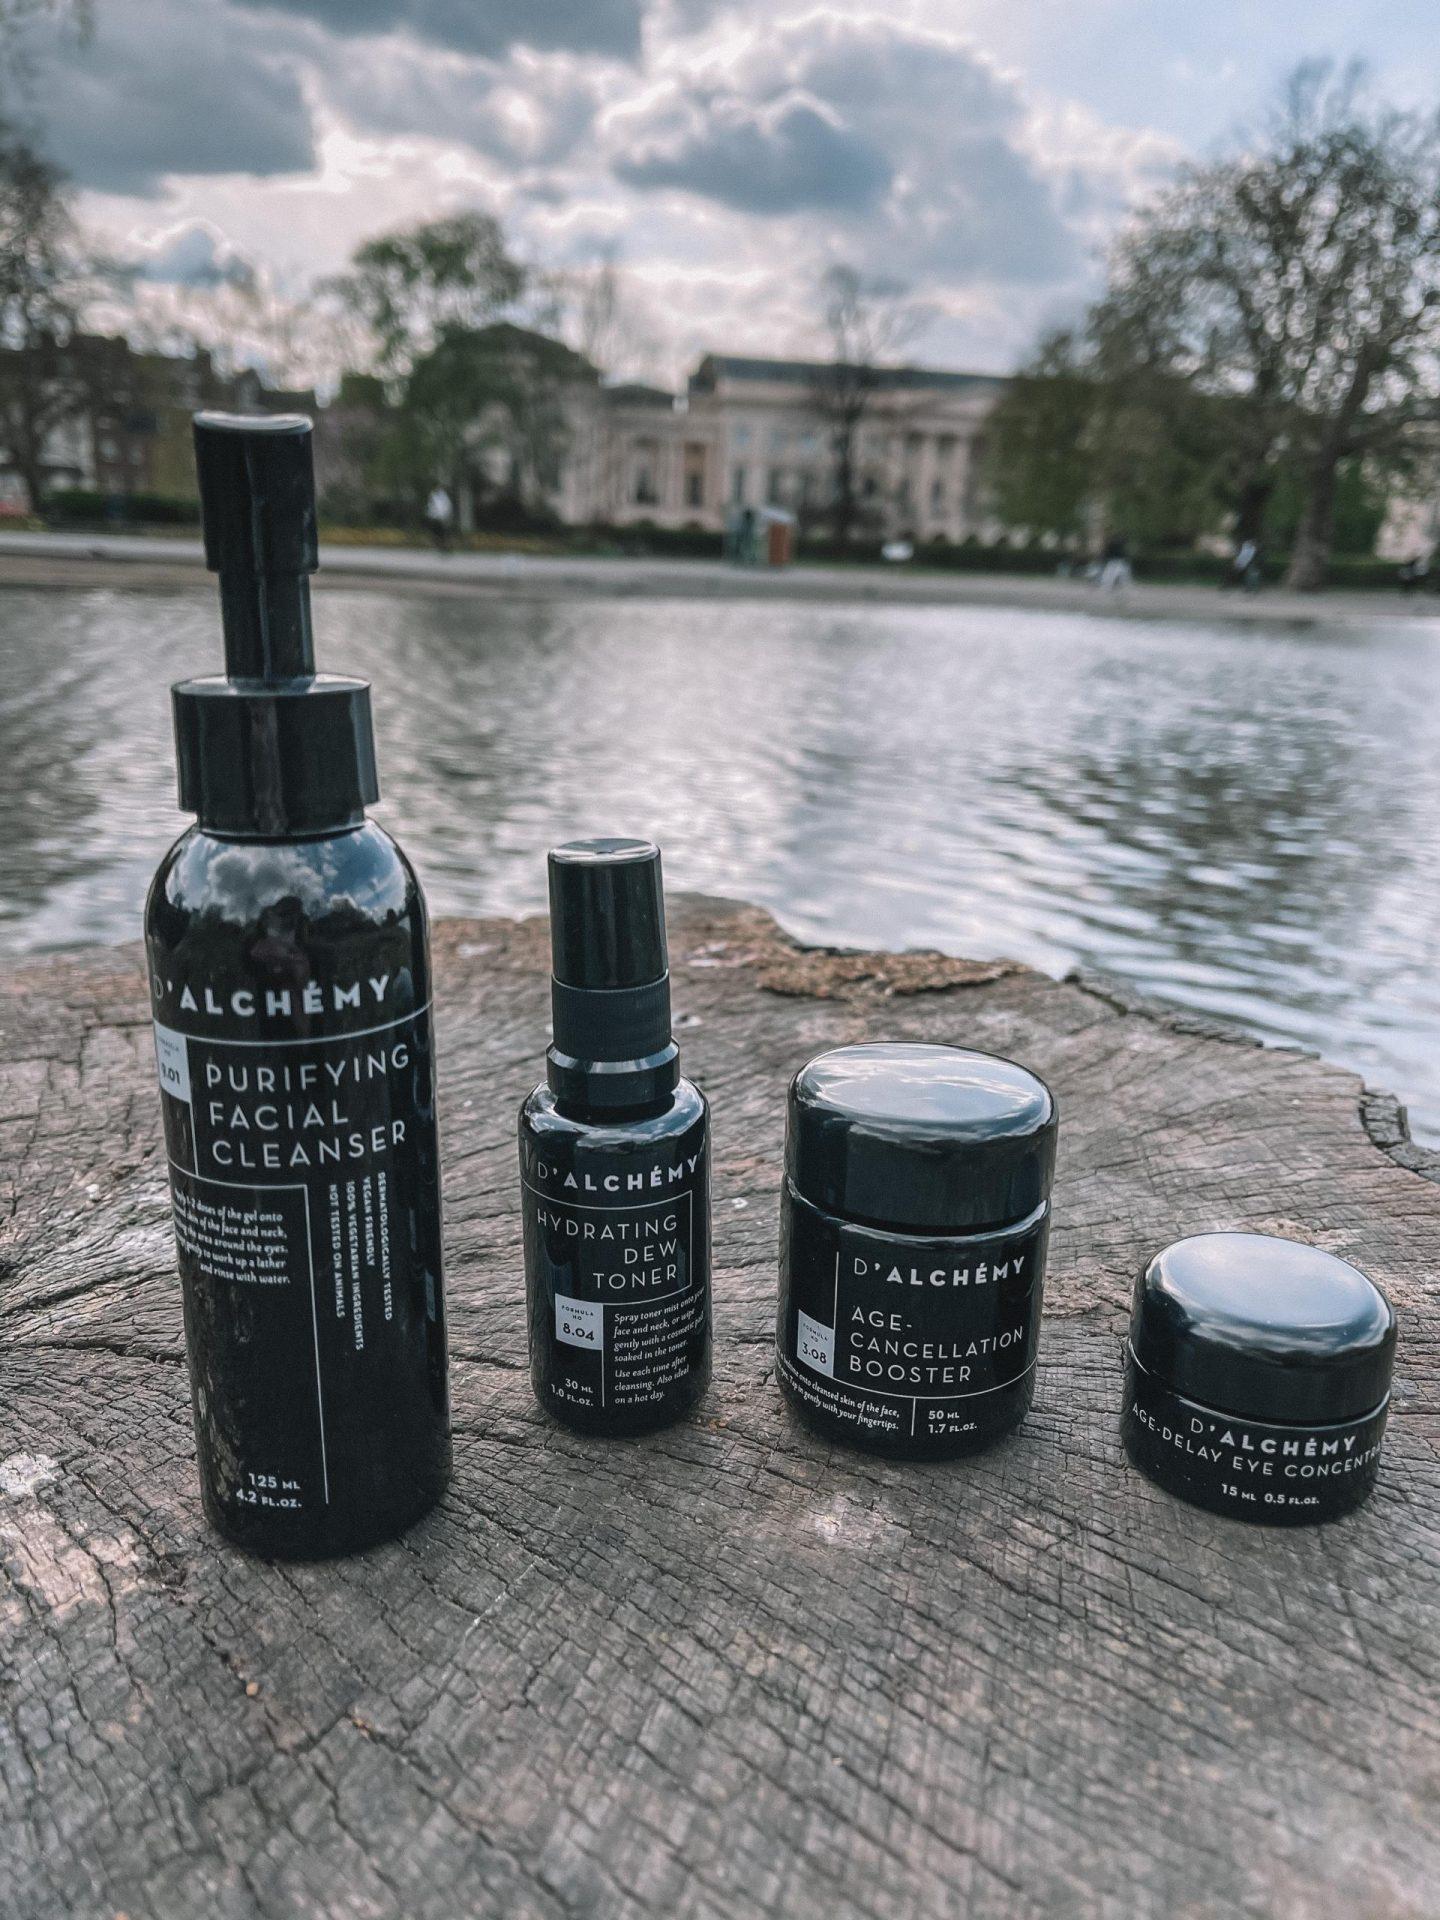 D'Alchemy - best green beauty brand